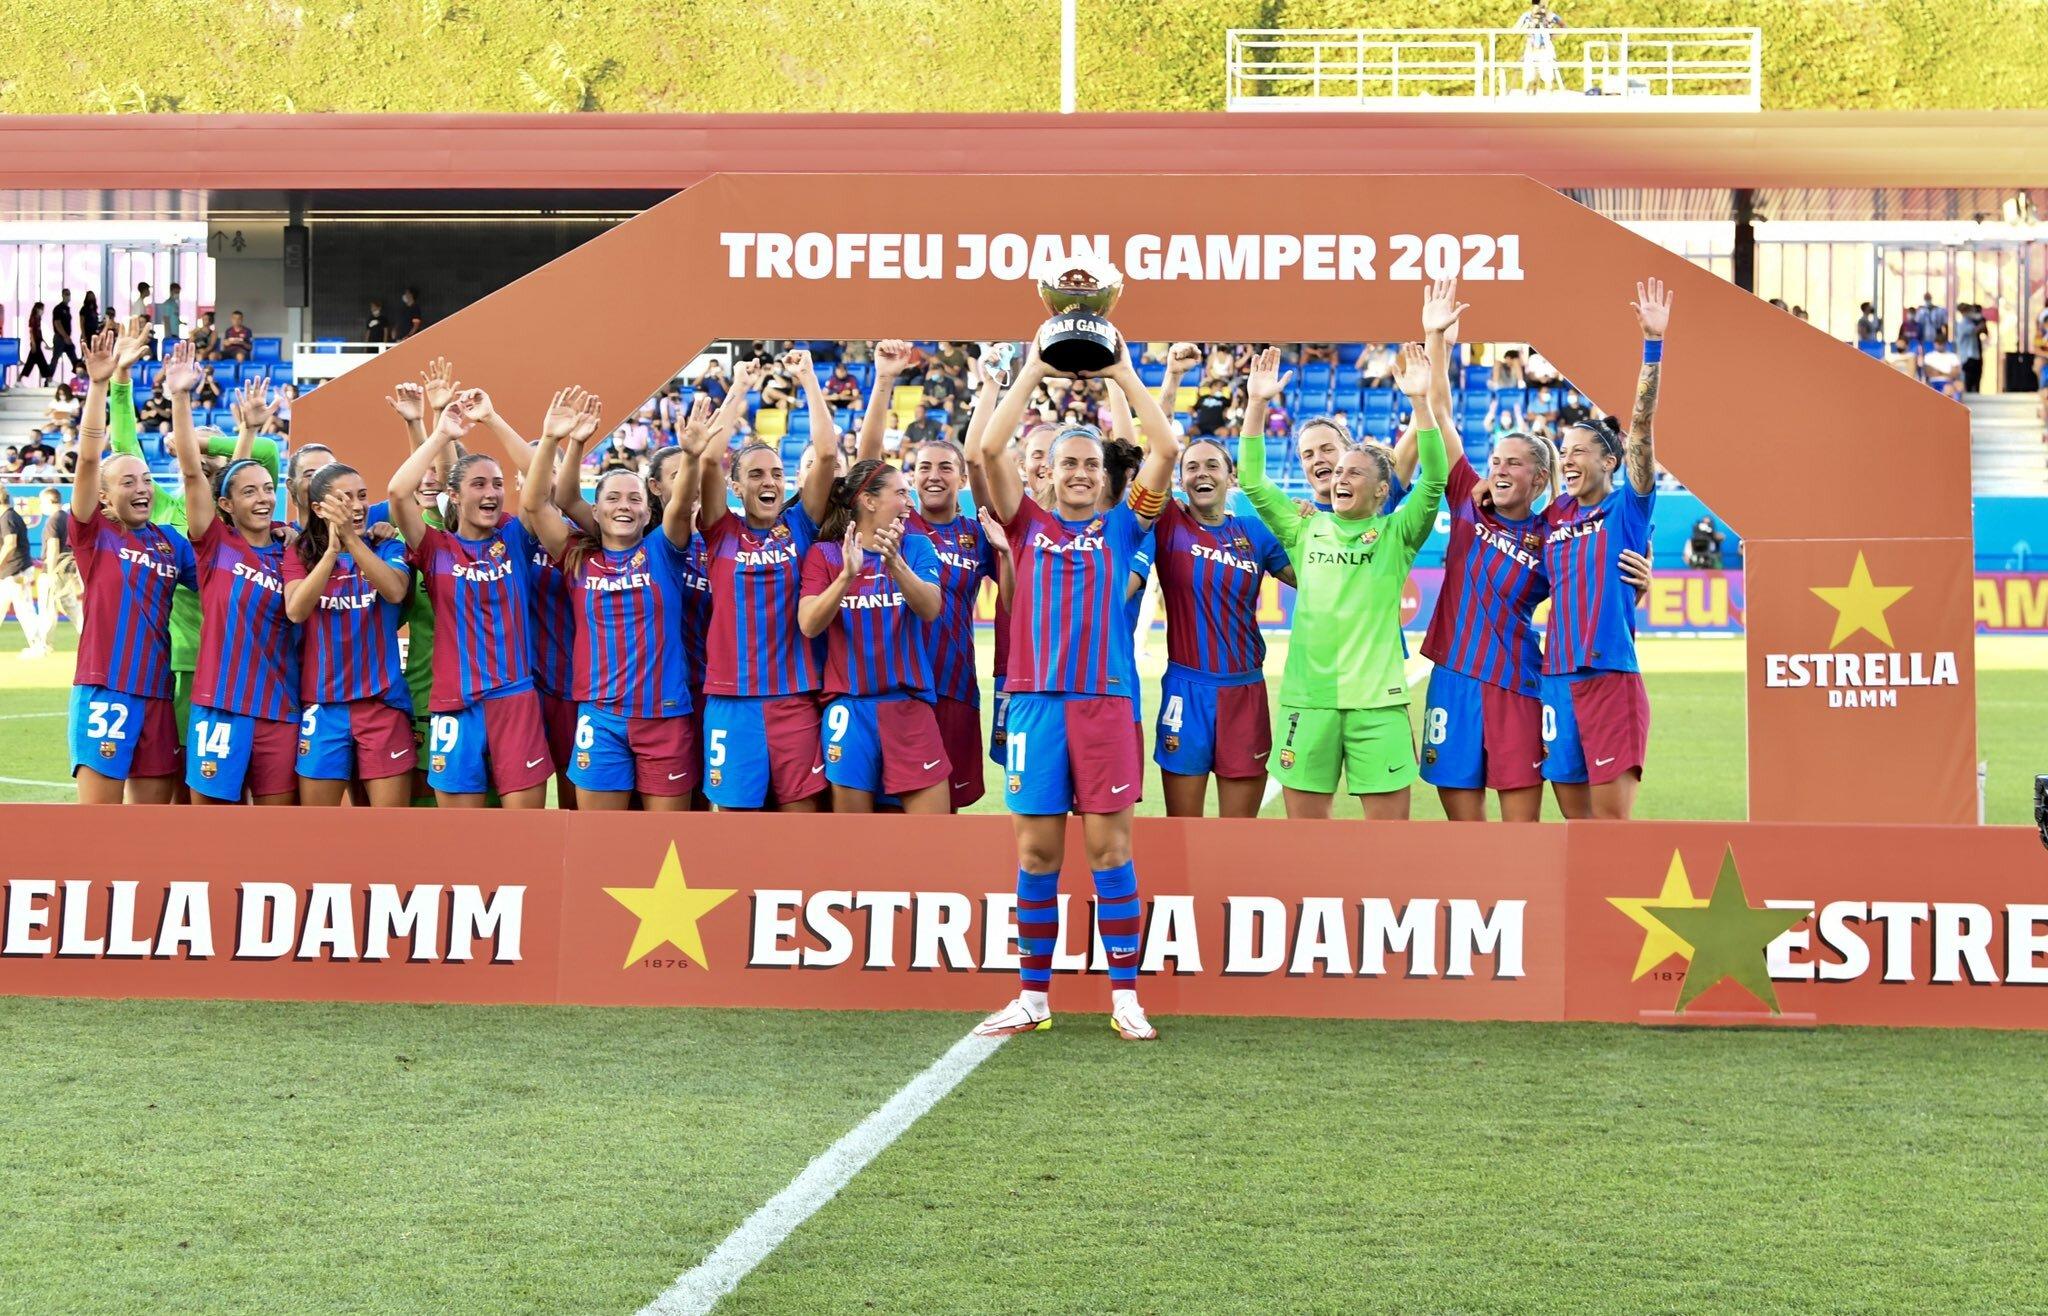 FC Barcelona no se relaja en pretemporada, goleó a Juventus y se llevó el Trofeo Joan Gamper